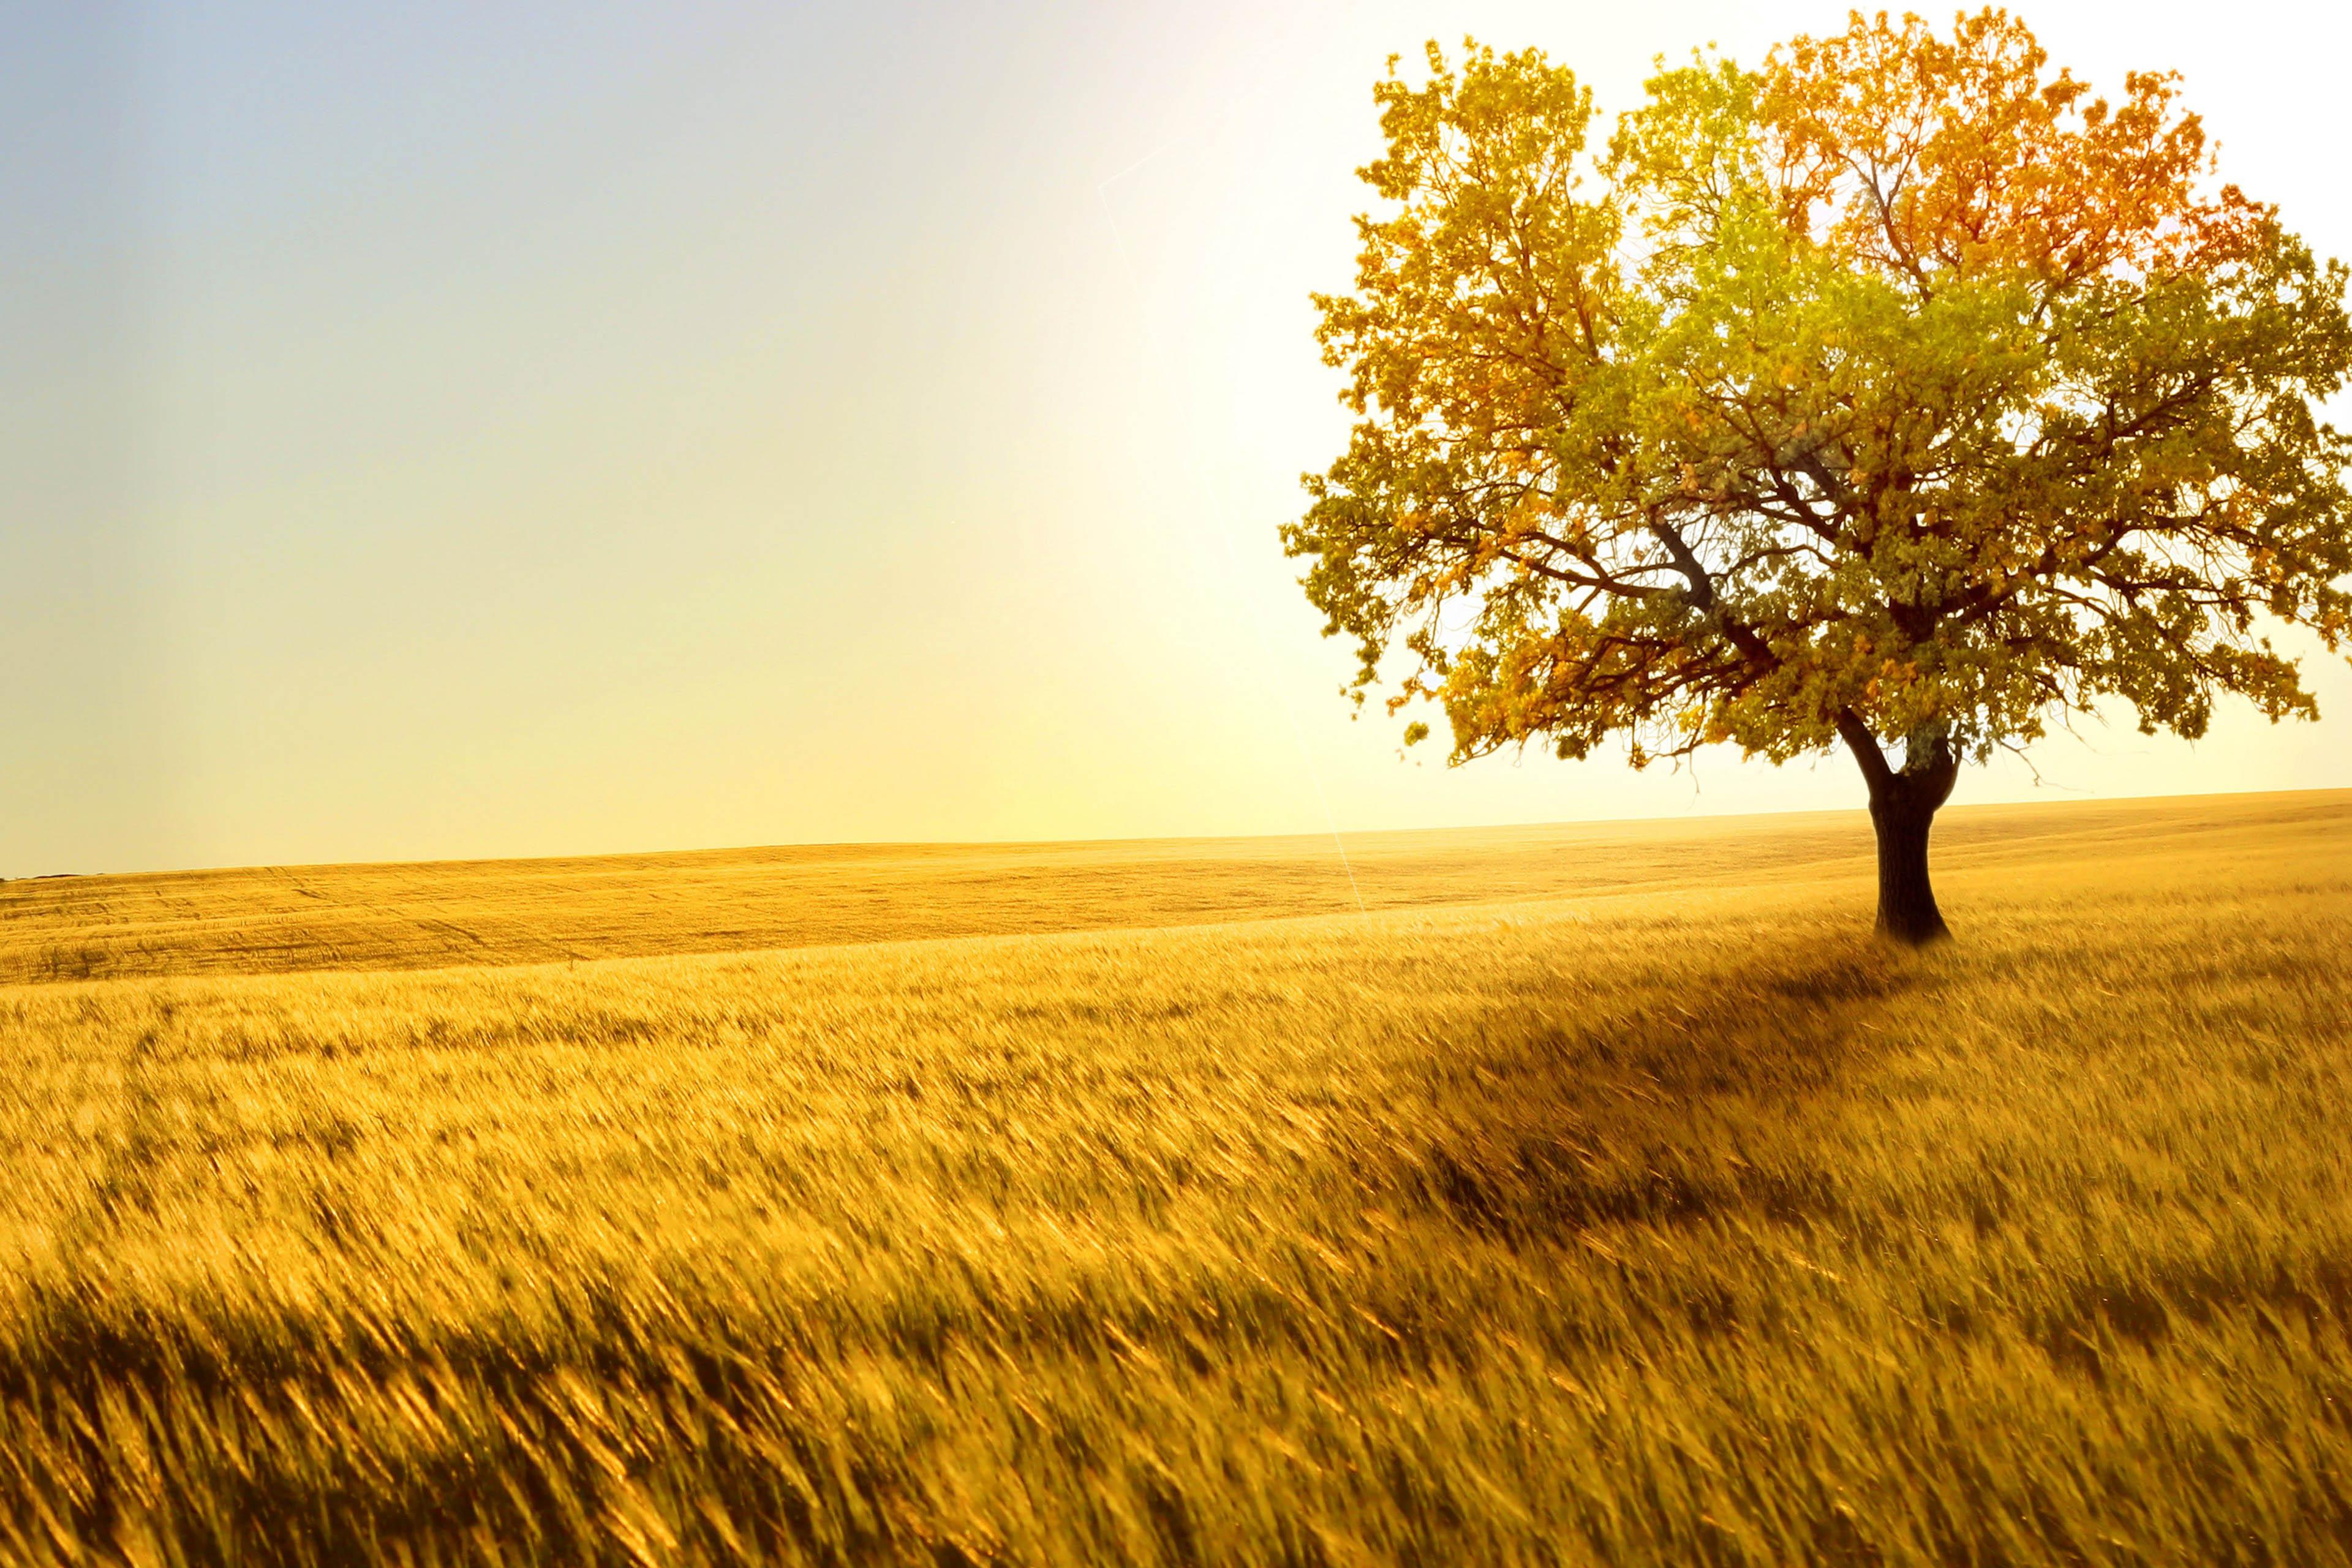 Field Backgrounds, Compatible - PC, Mobile, Gadgets| 3840x2560 px